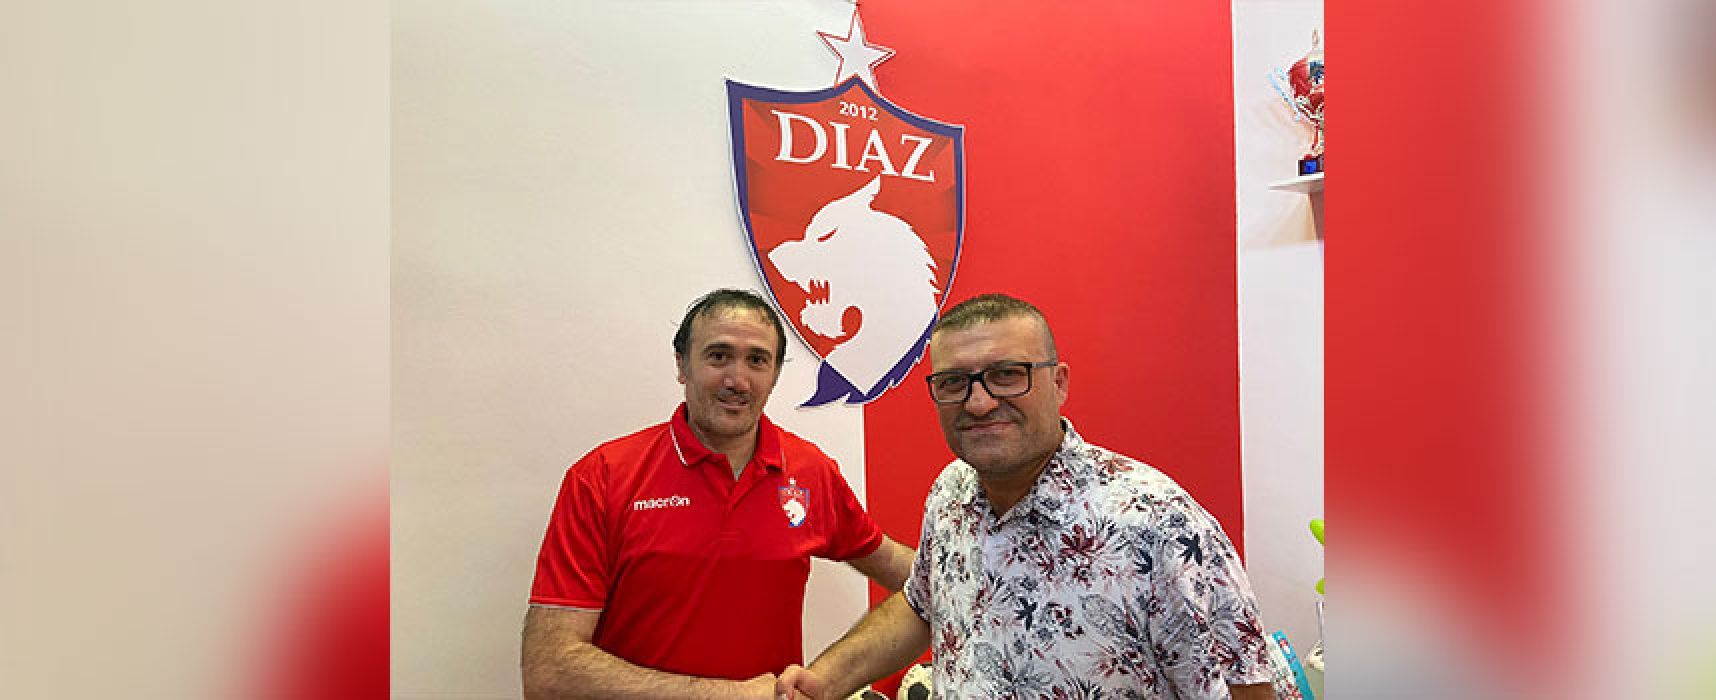 La Diaz allarga la base societaria, importante innesto quello di Nicola de Venuto